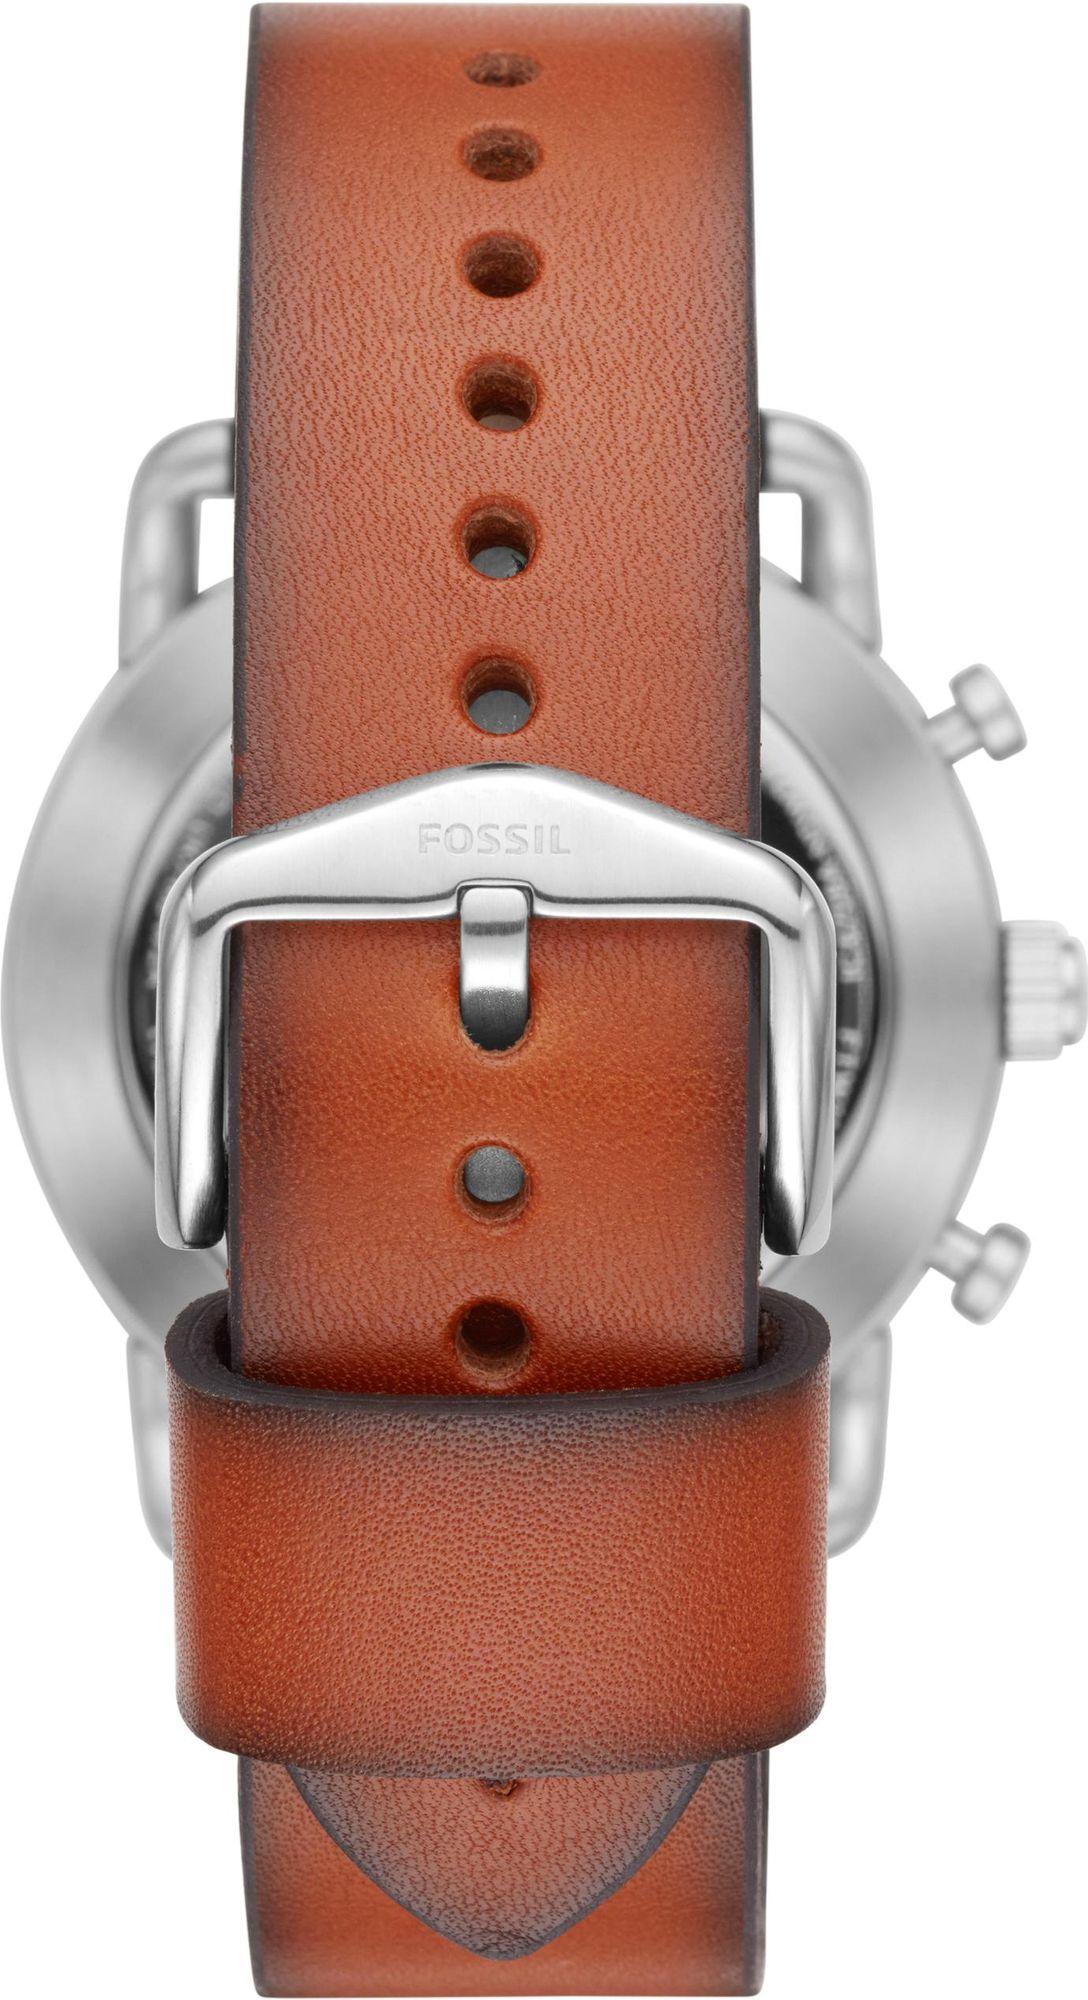 Fossil Q FTW1151 Smartwatch SmartWatch